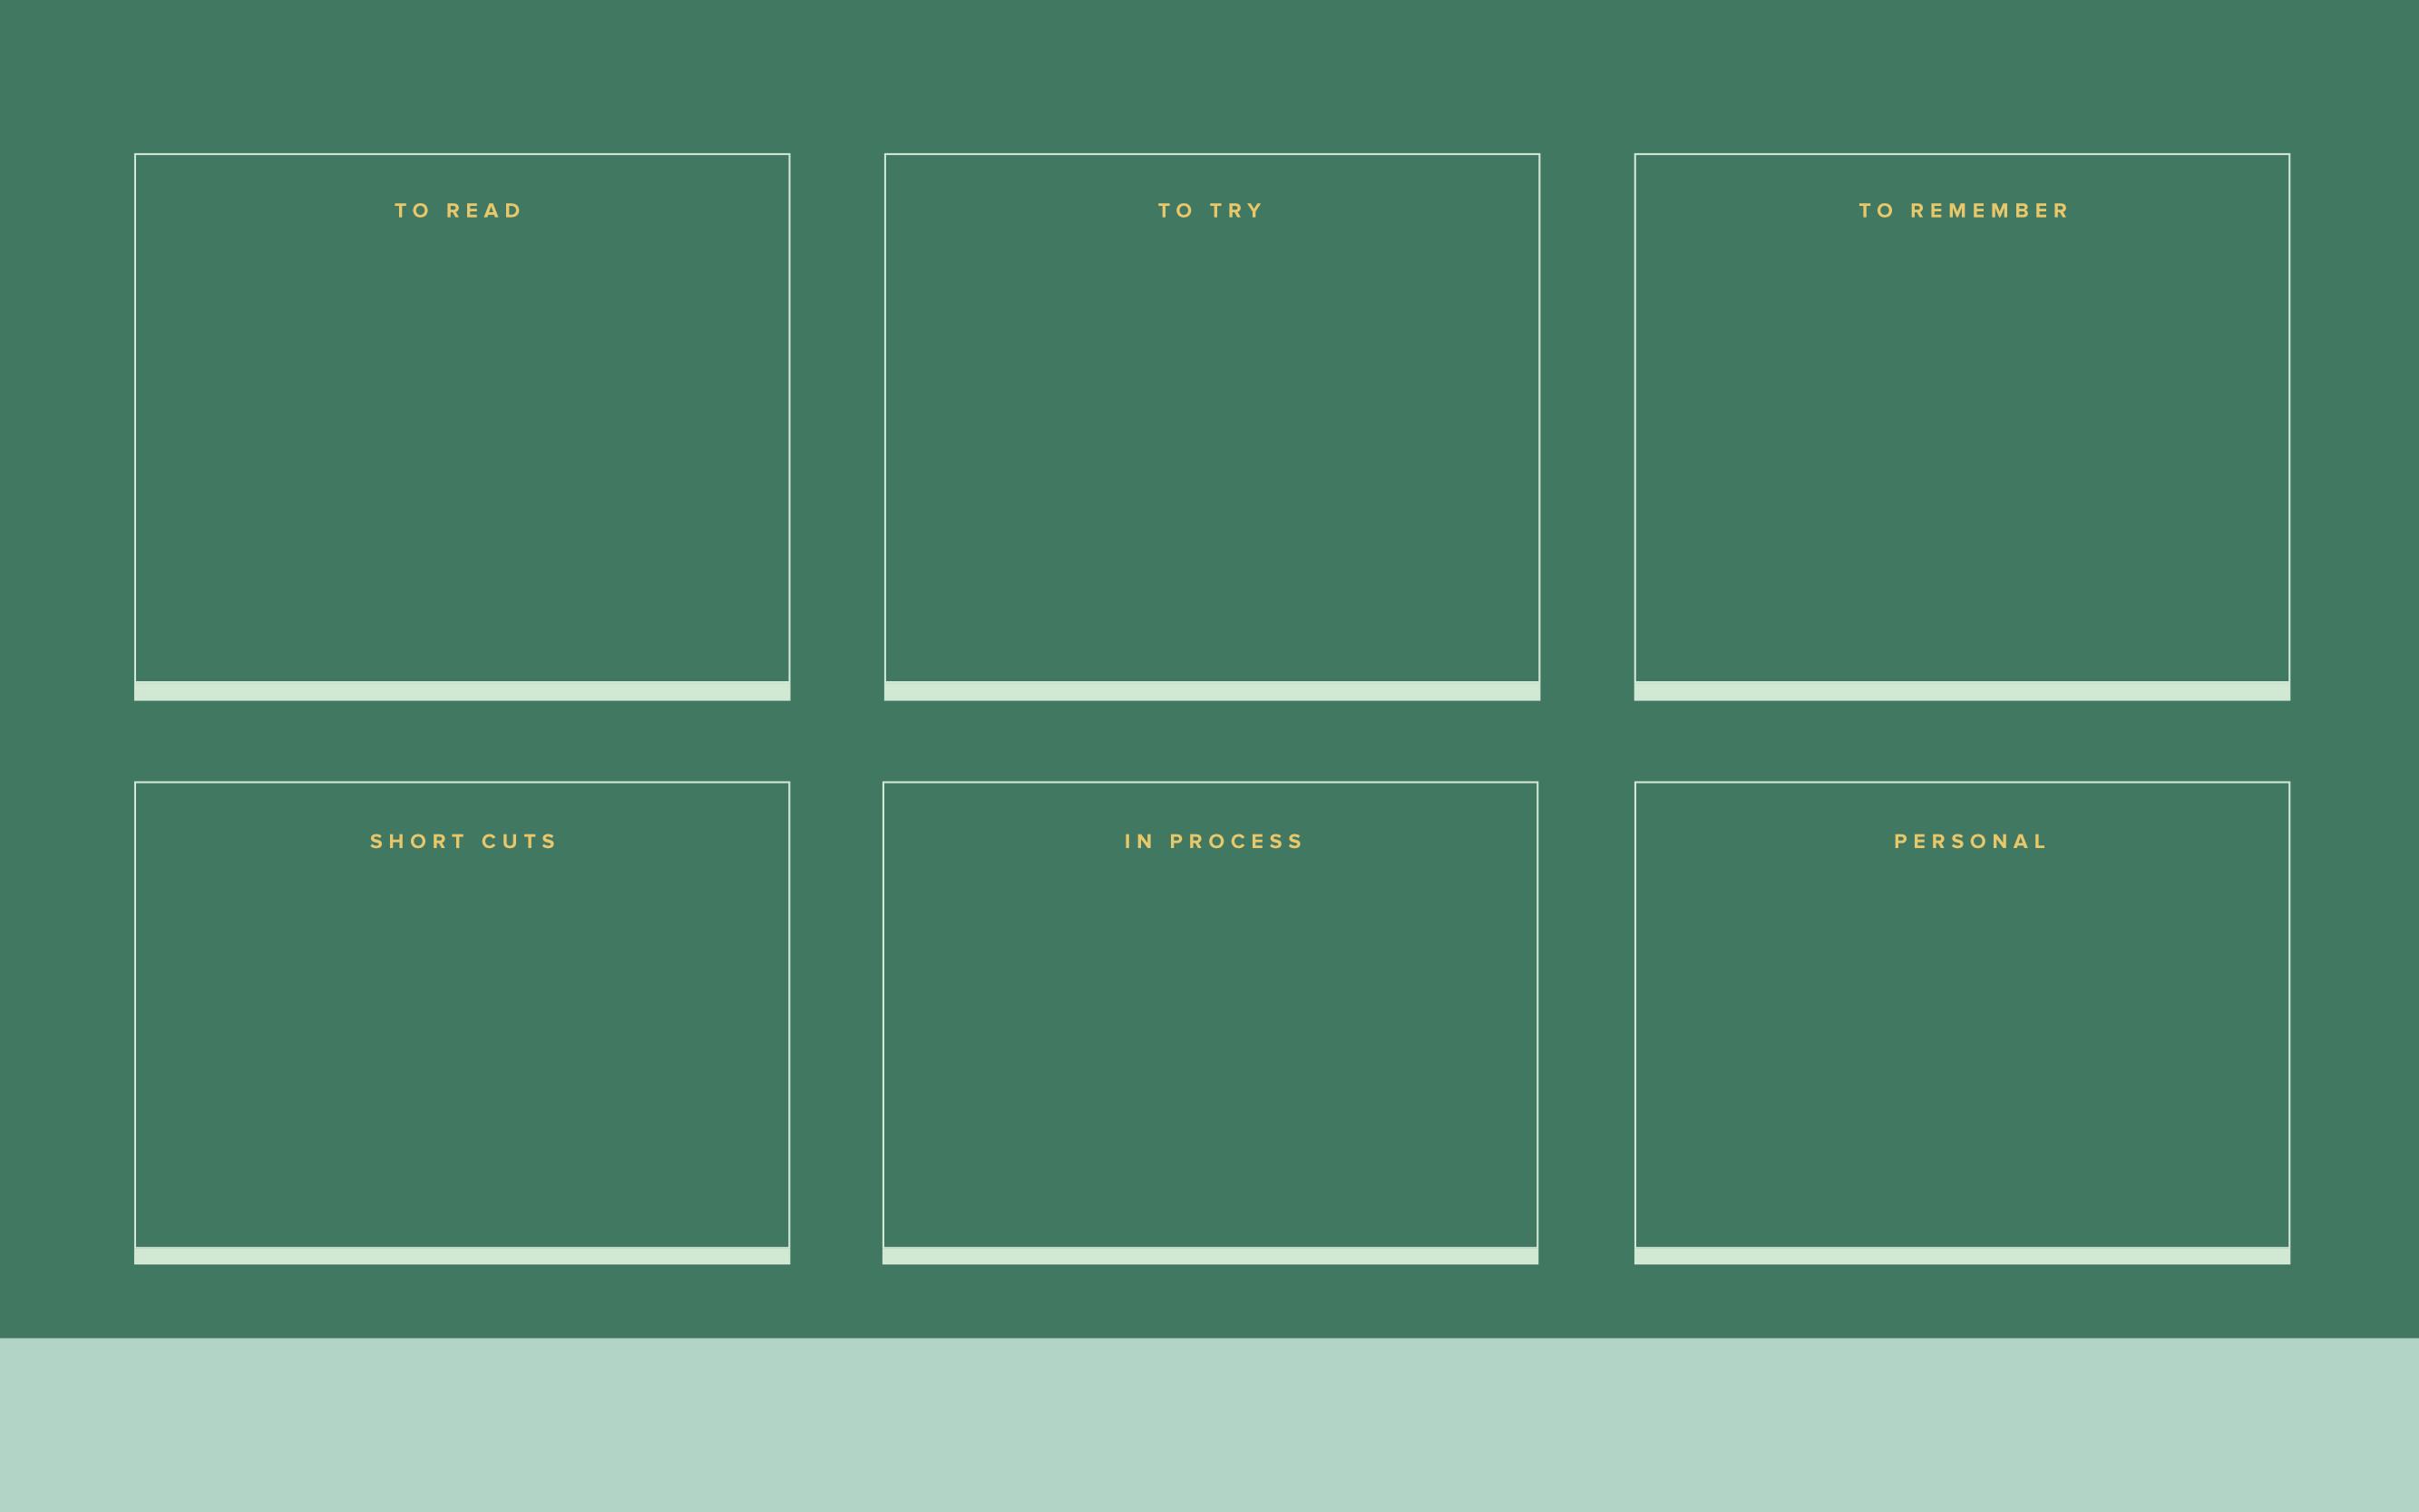 desktop organizer wallpaper,green,text,pattern,line,sport venue